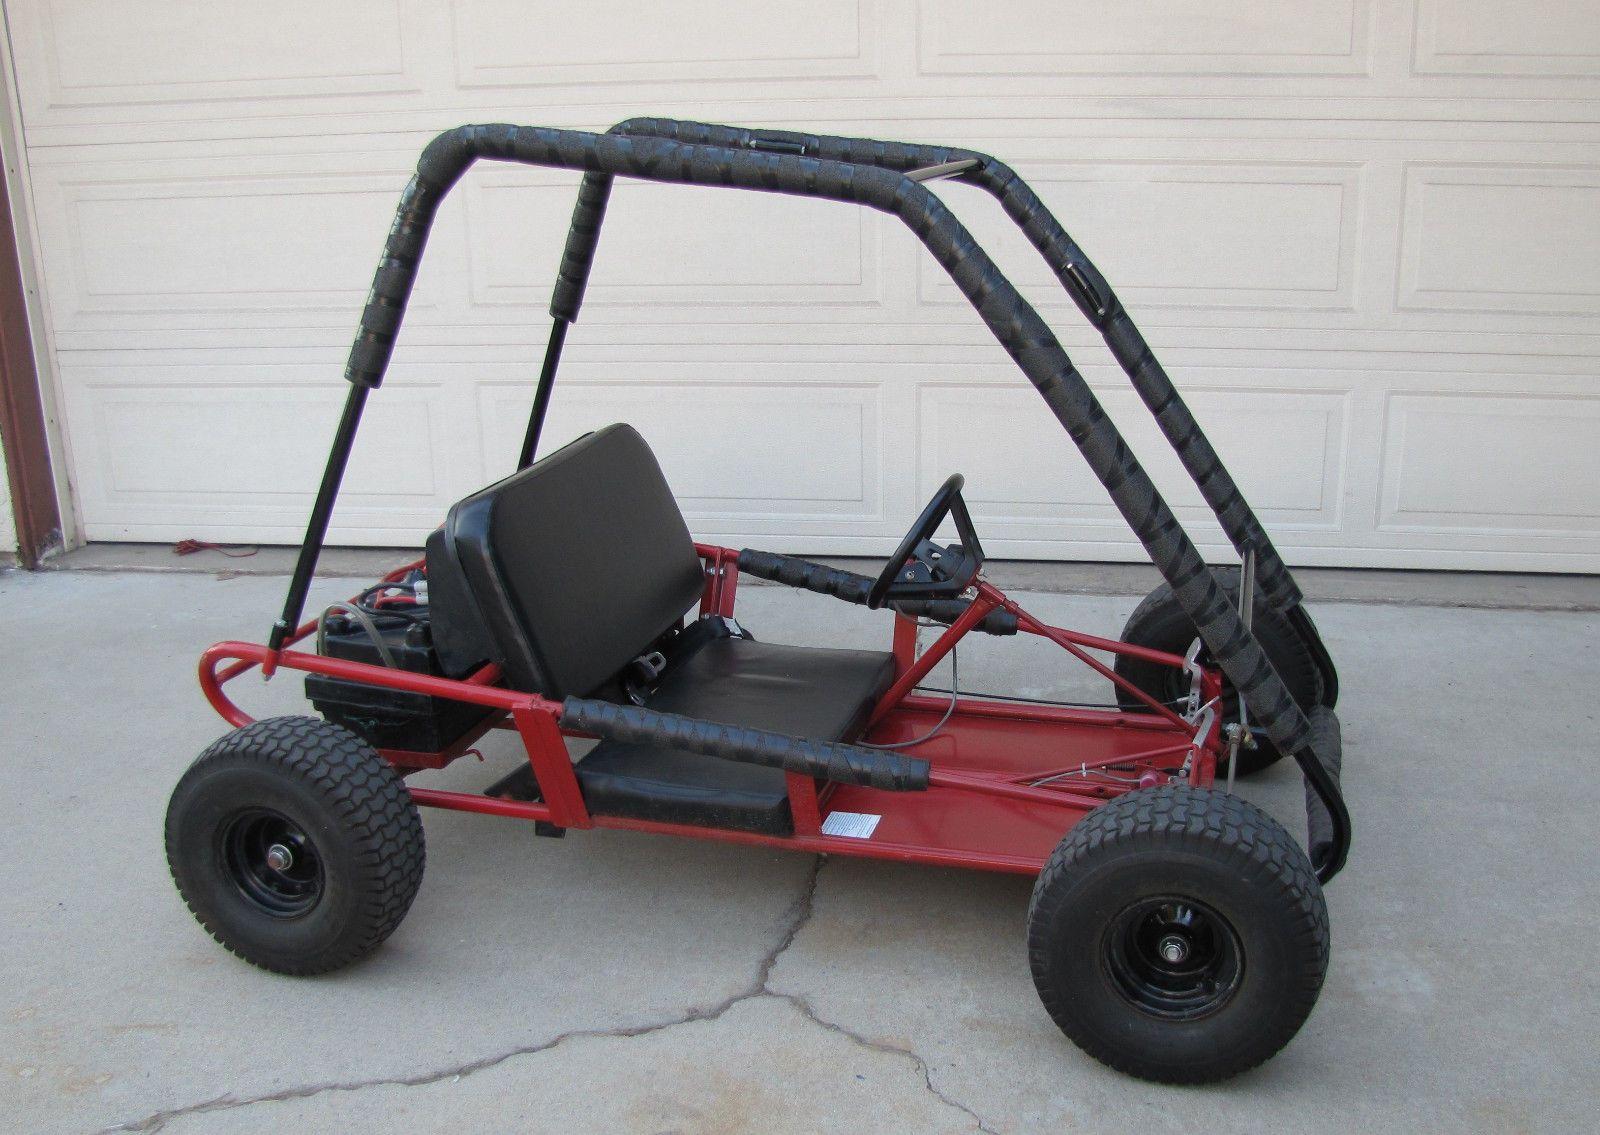 Working Kango Electric Go Kart Go Cart | eBay | ATV | Electric go